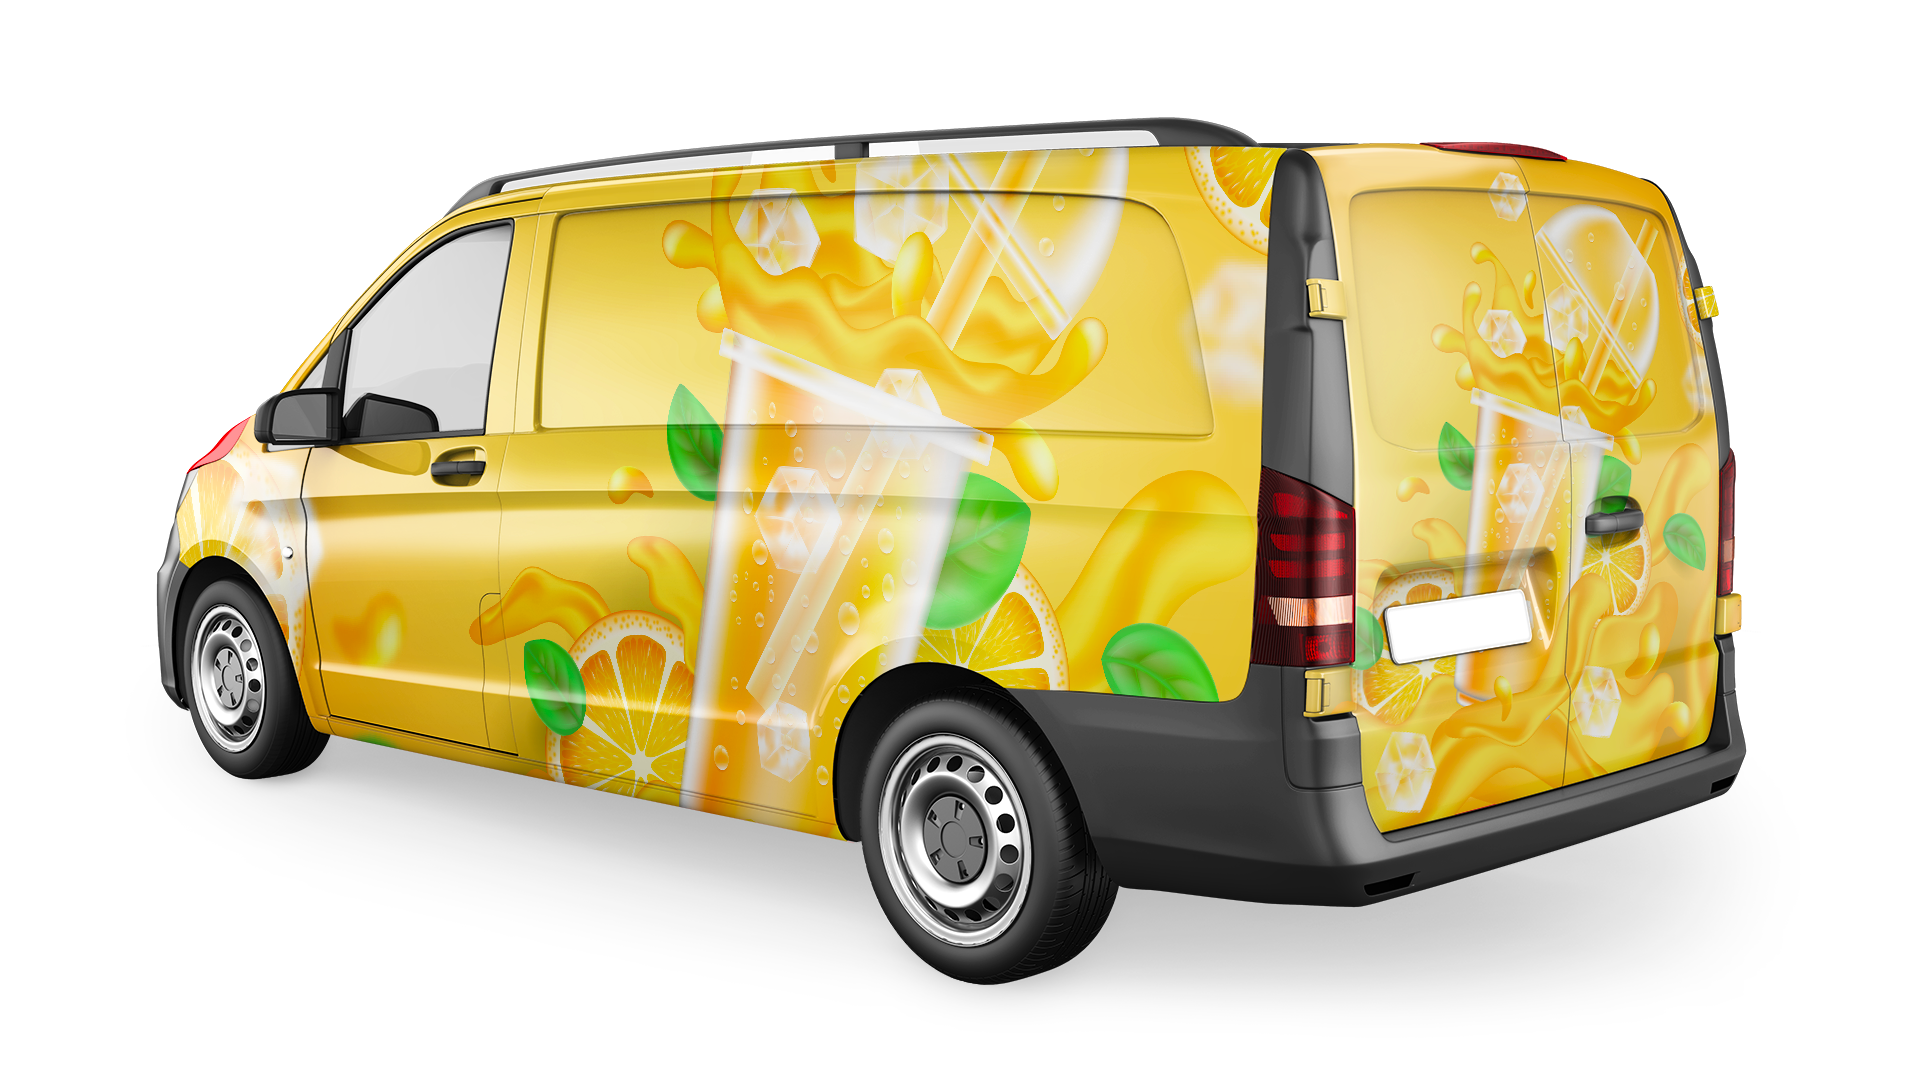 stampa-adesivi-auto-camion